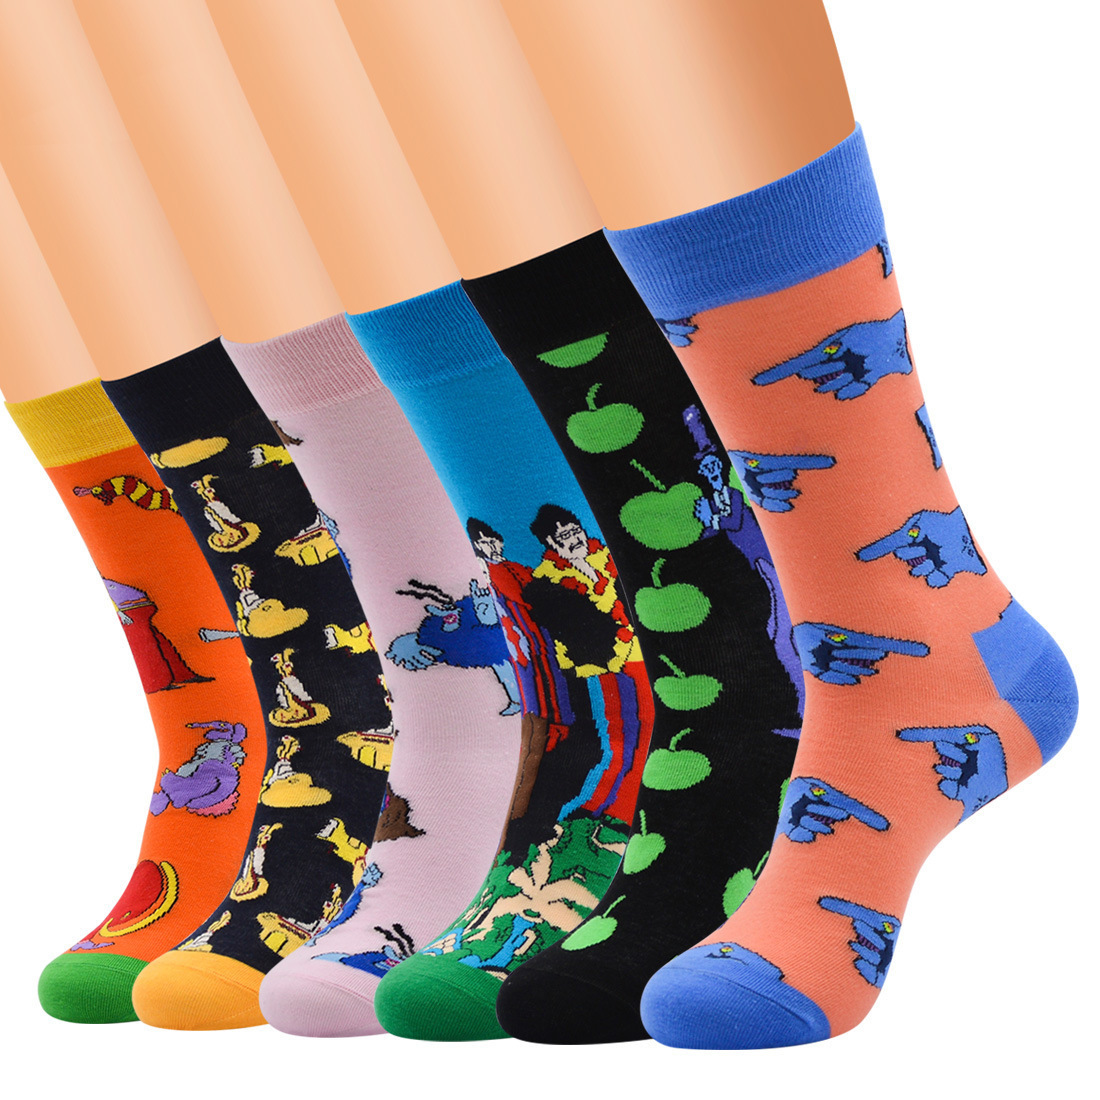 Chinese Panda Element mens socks cool socks